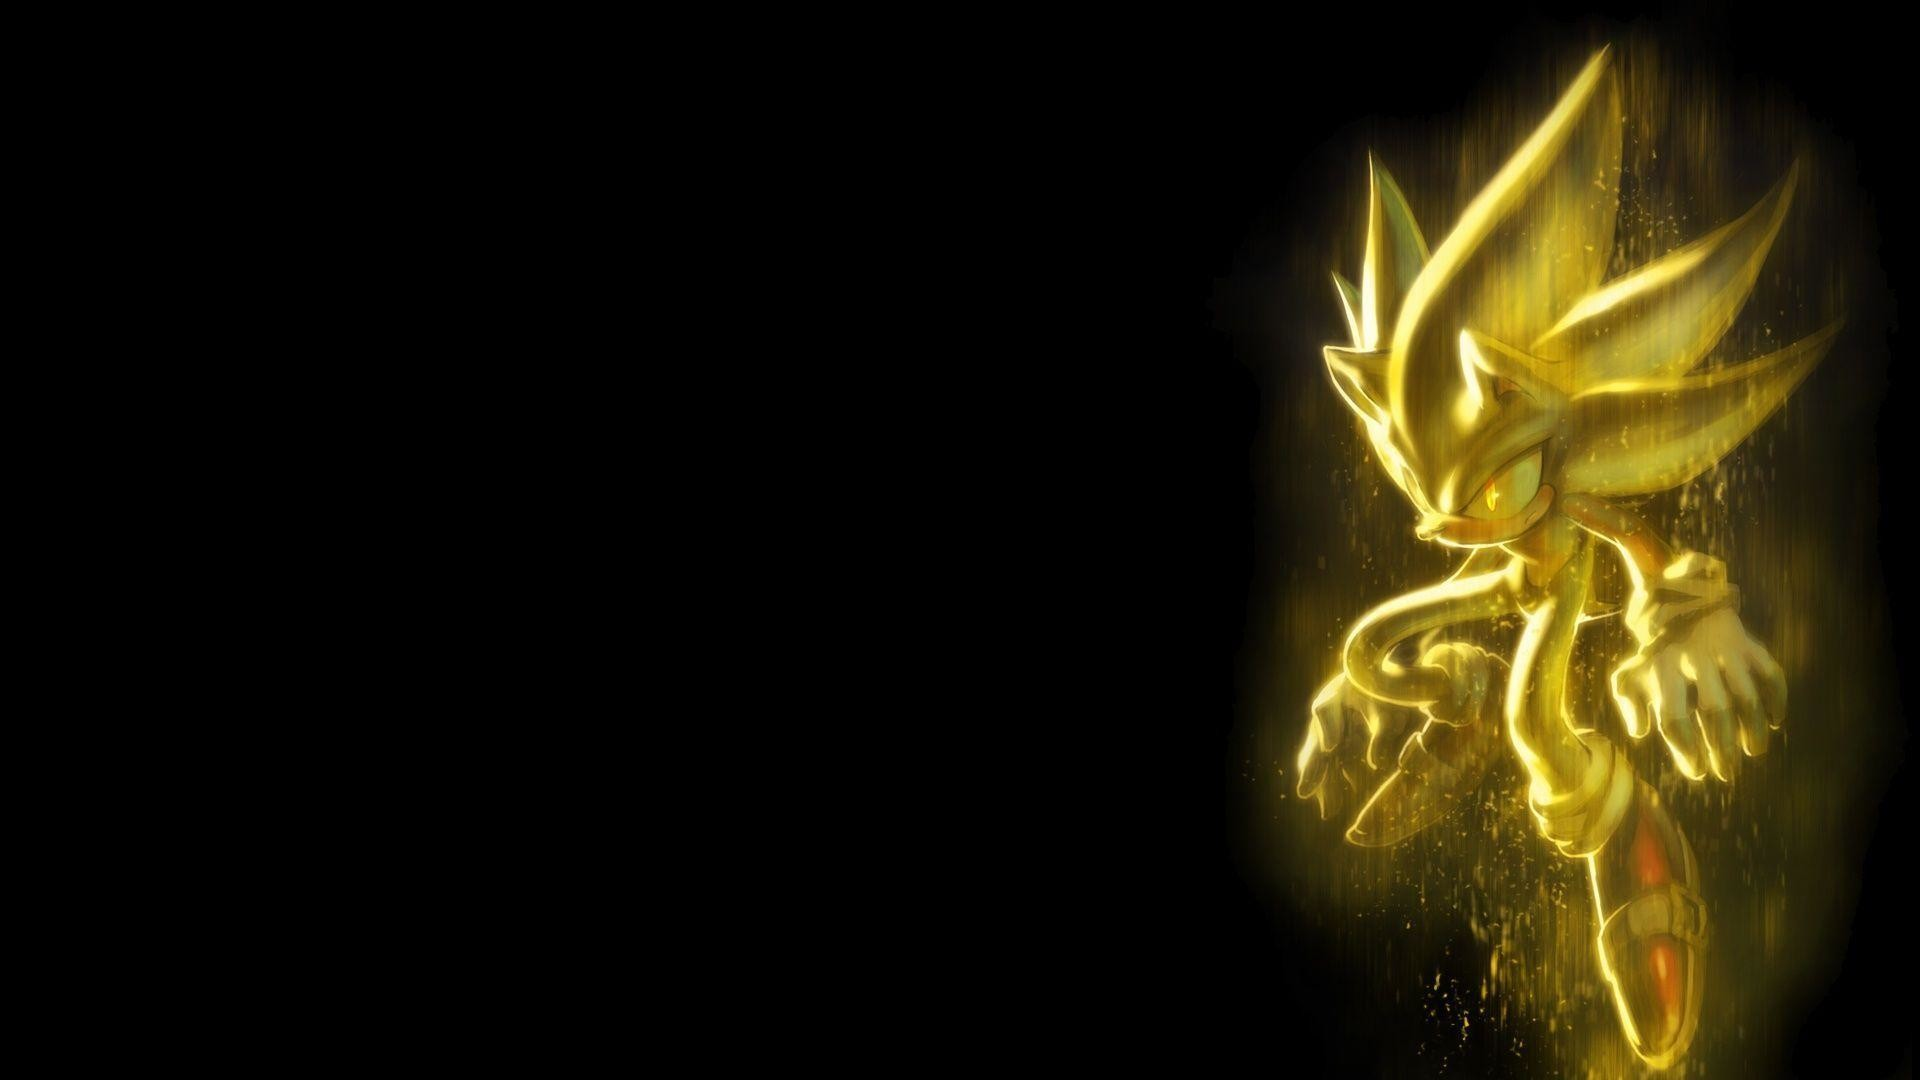 Gold Sonic Wallpaper, Cartons & Animations Wallpaper, hd phone .